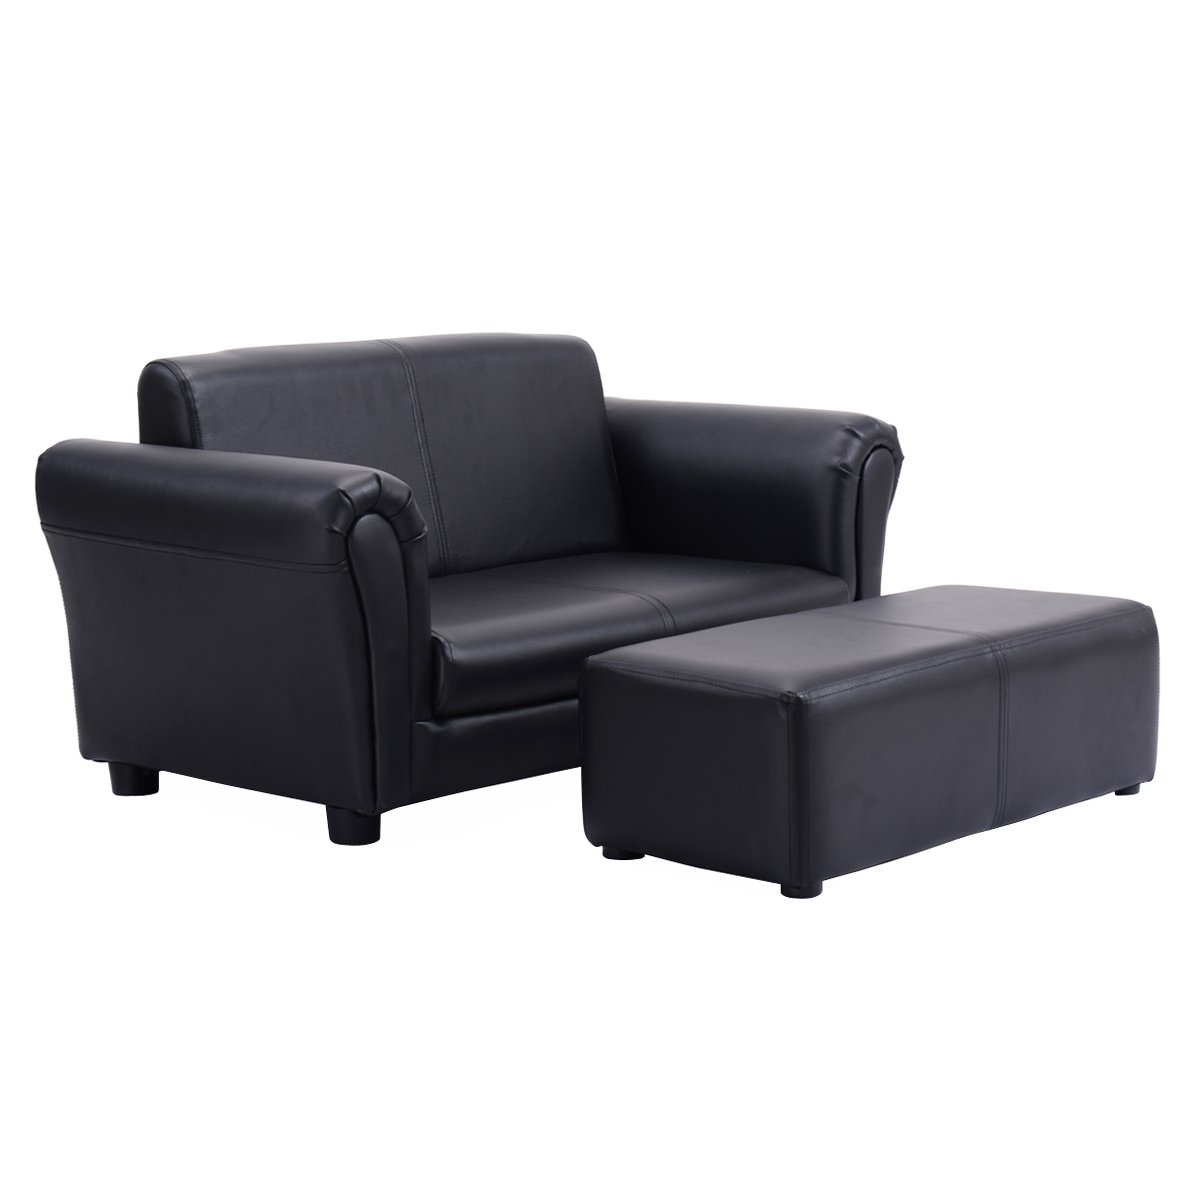 Amazon Com Keet Roundy Denim Children S Chair Sofa And